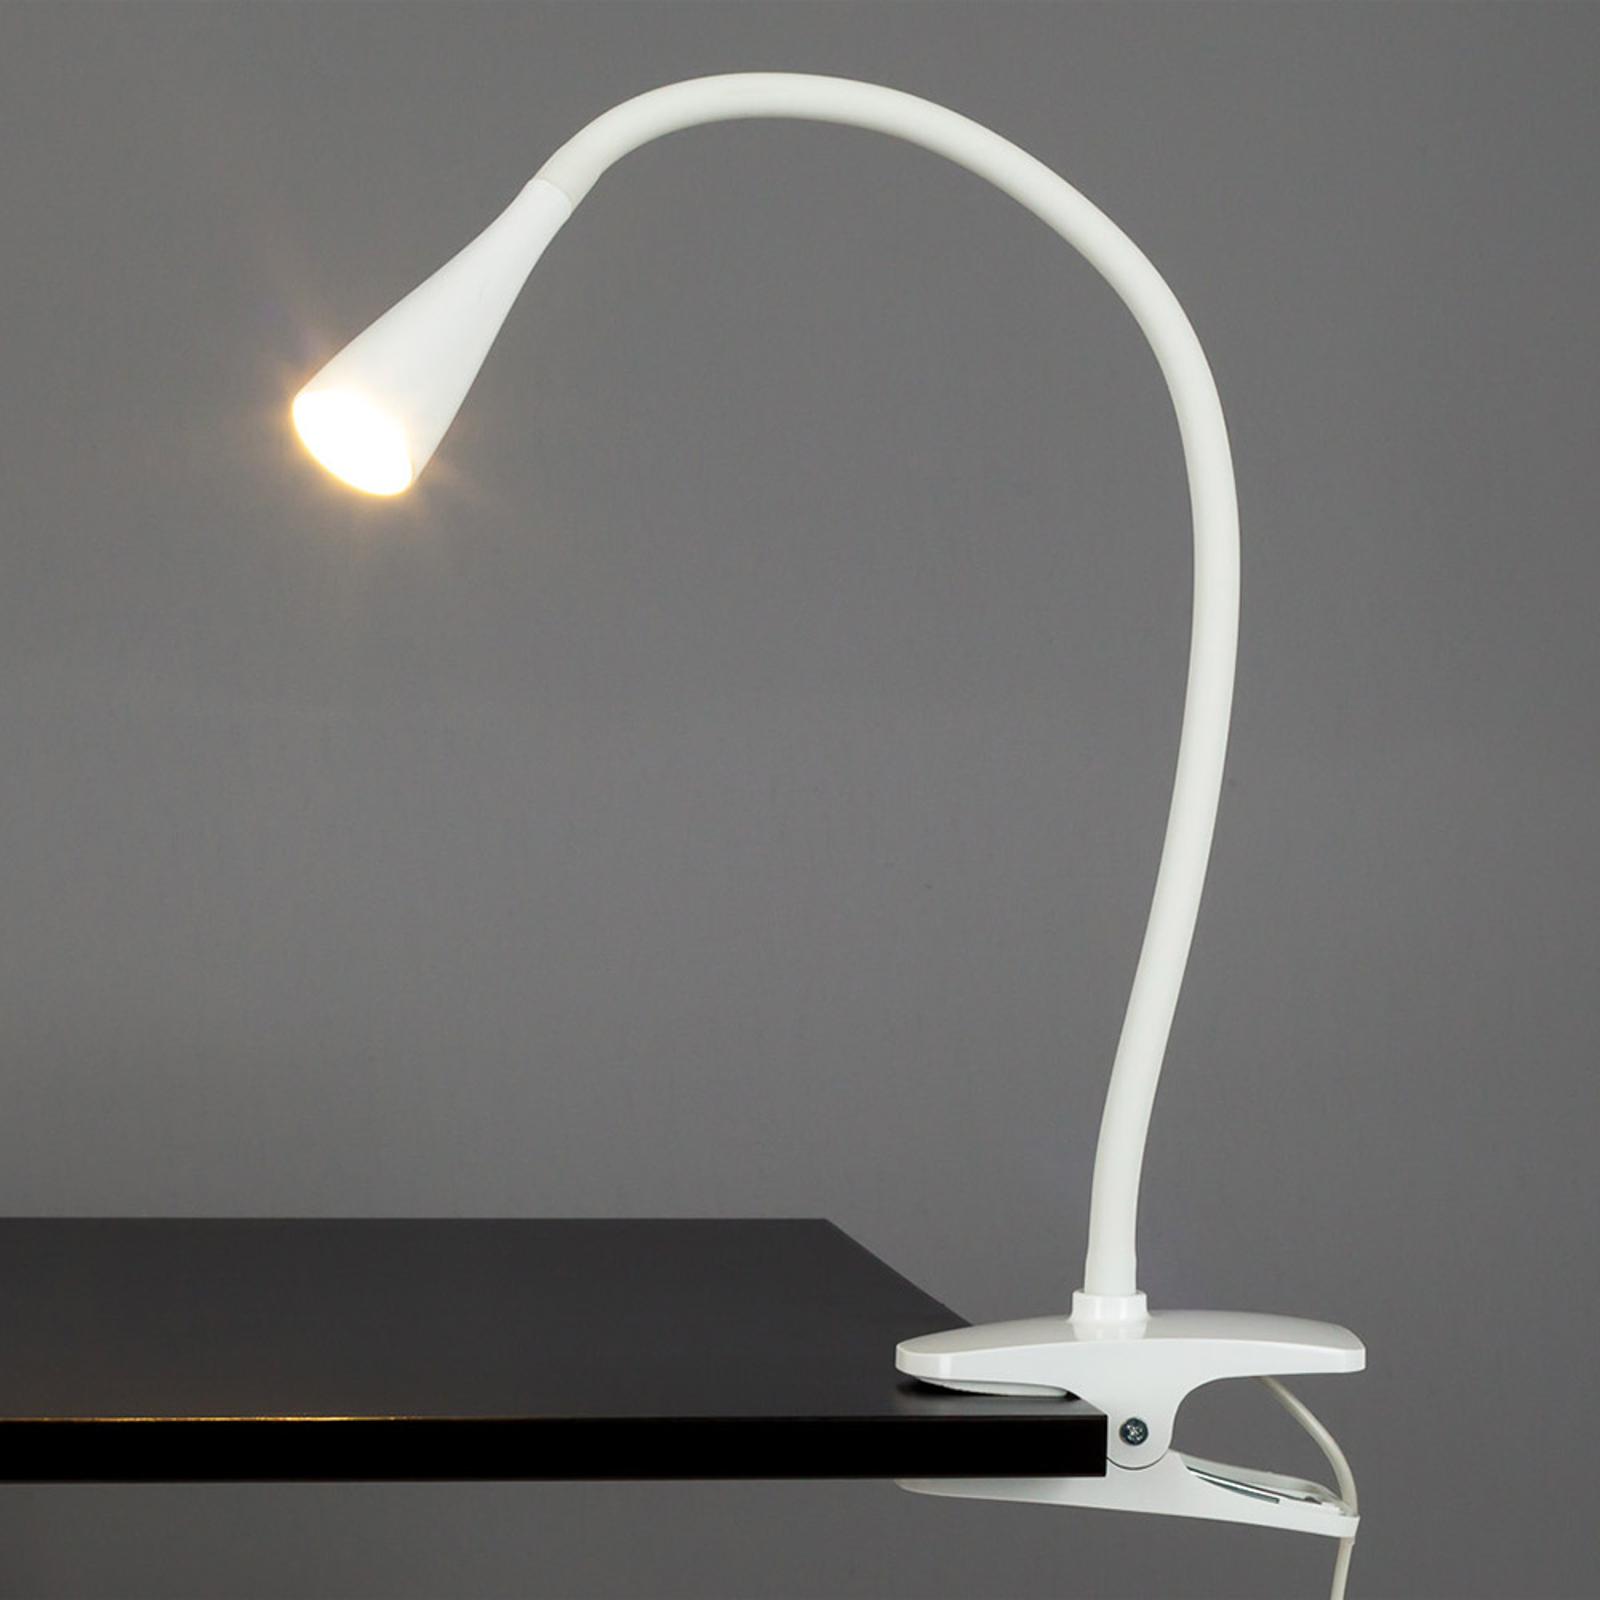 Esbelta lámparaLED de pinzaBaris blanca